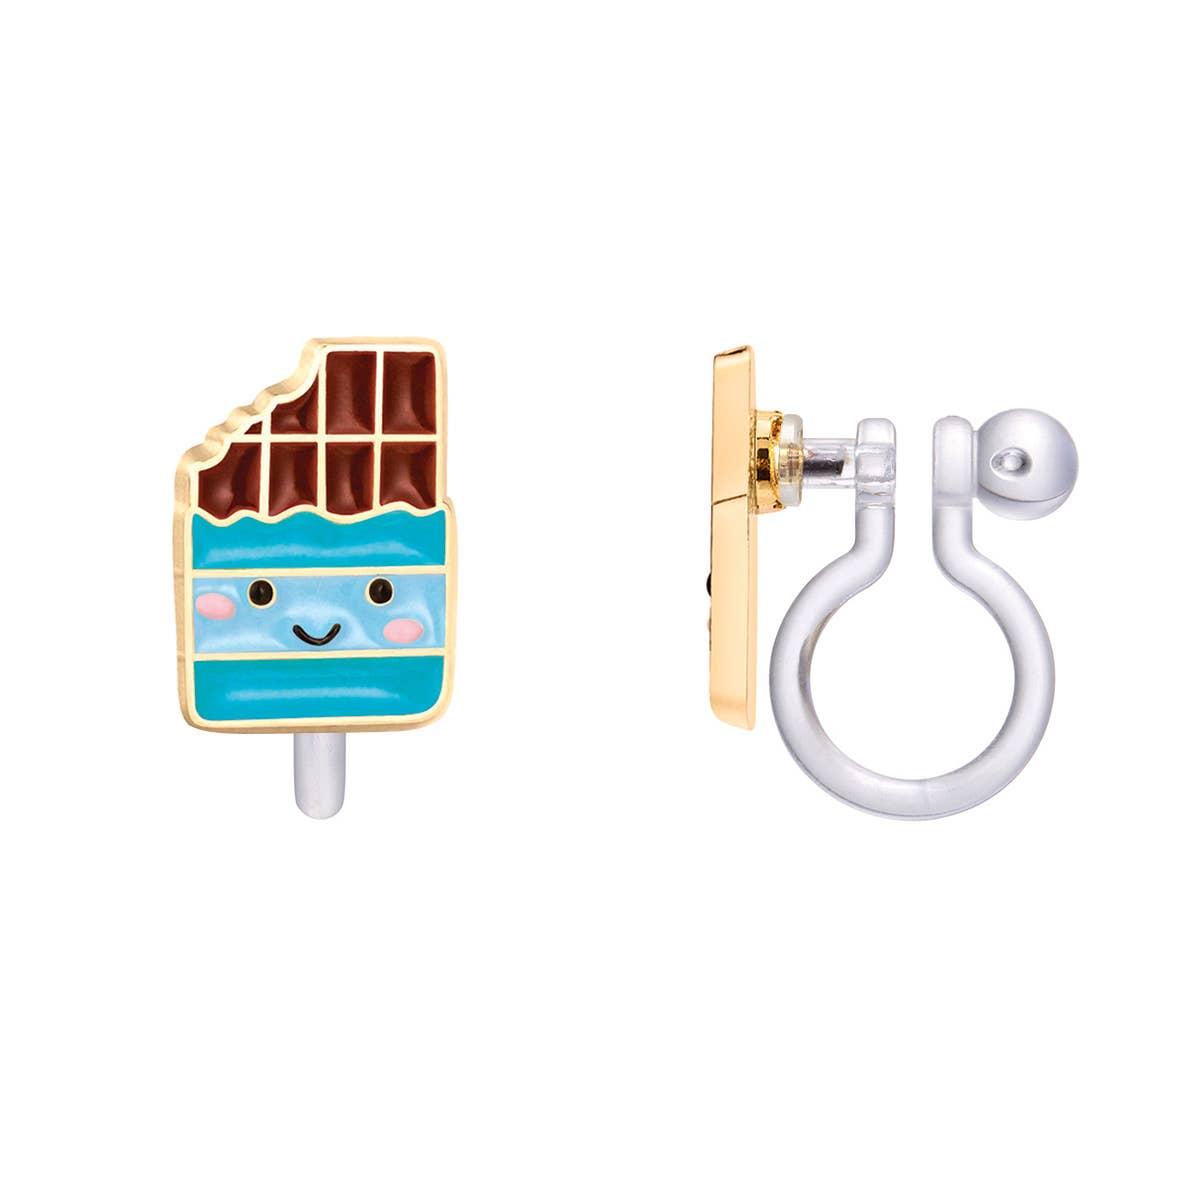 CLIP ON Cutie Earrings- Cheery Chocolate | Trada Marketplace